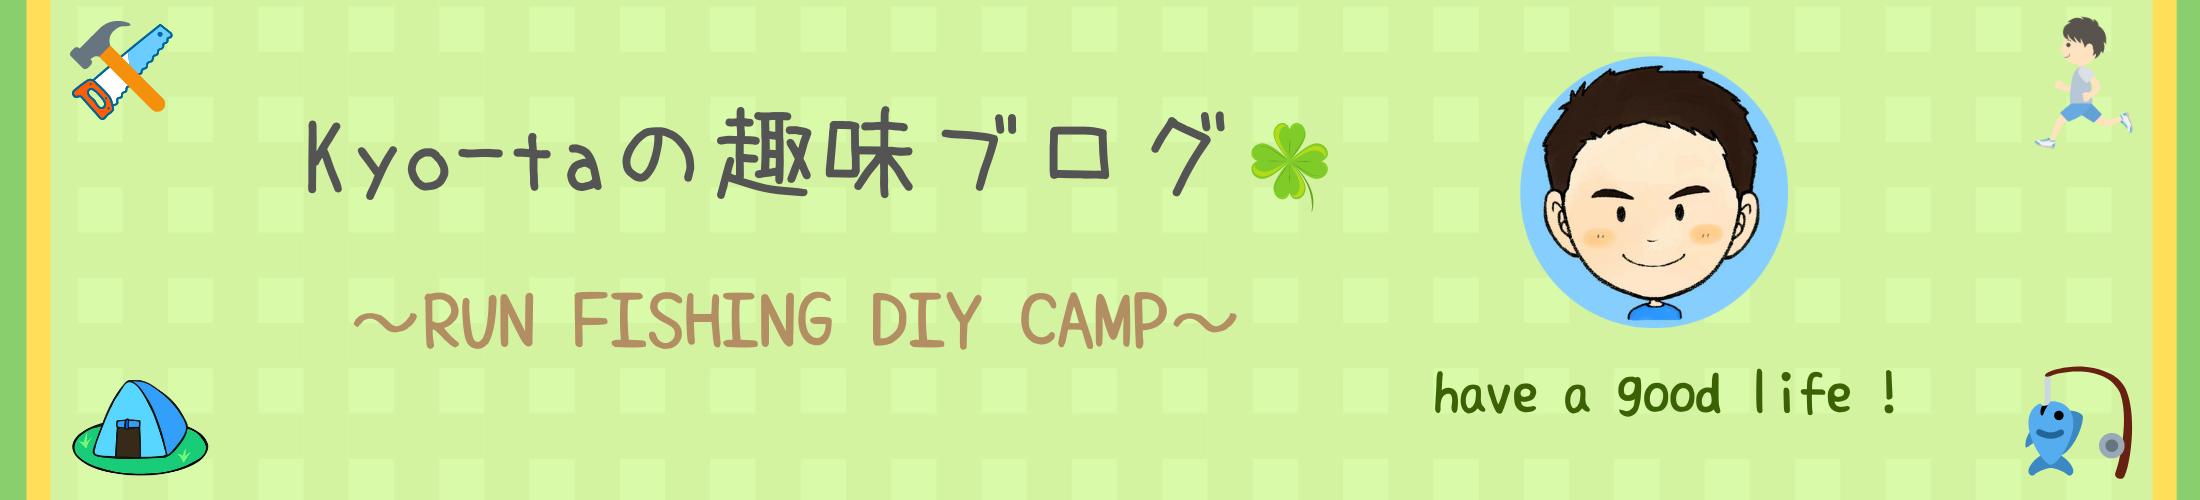 Kyo-taの趣味ブログ